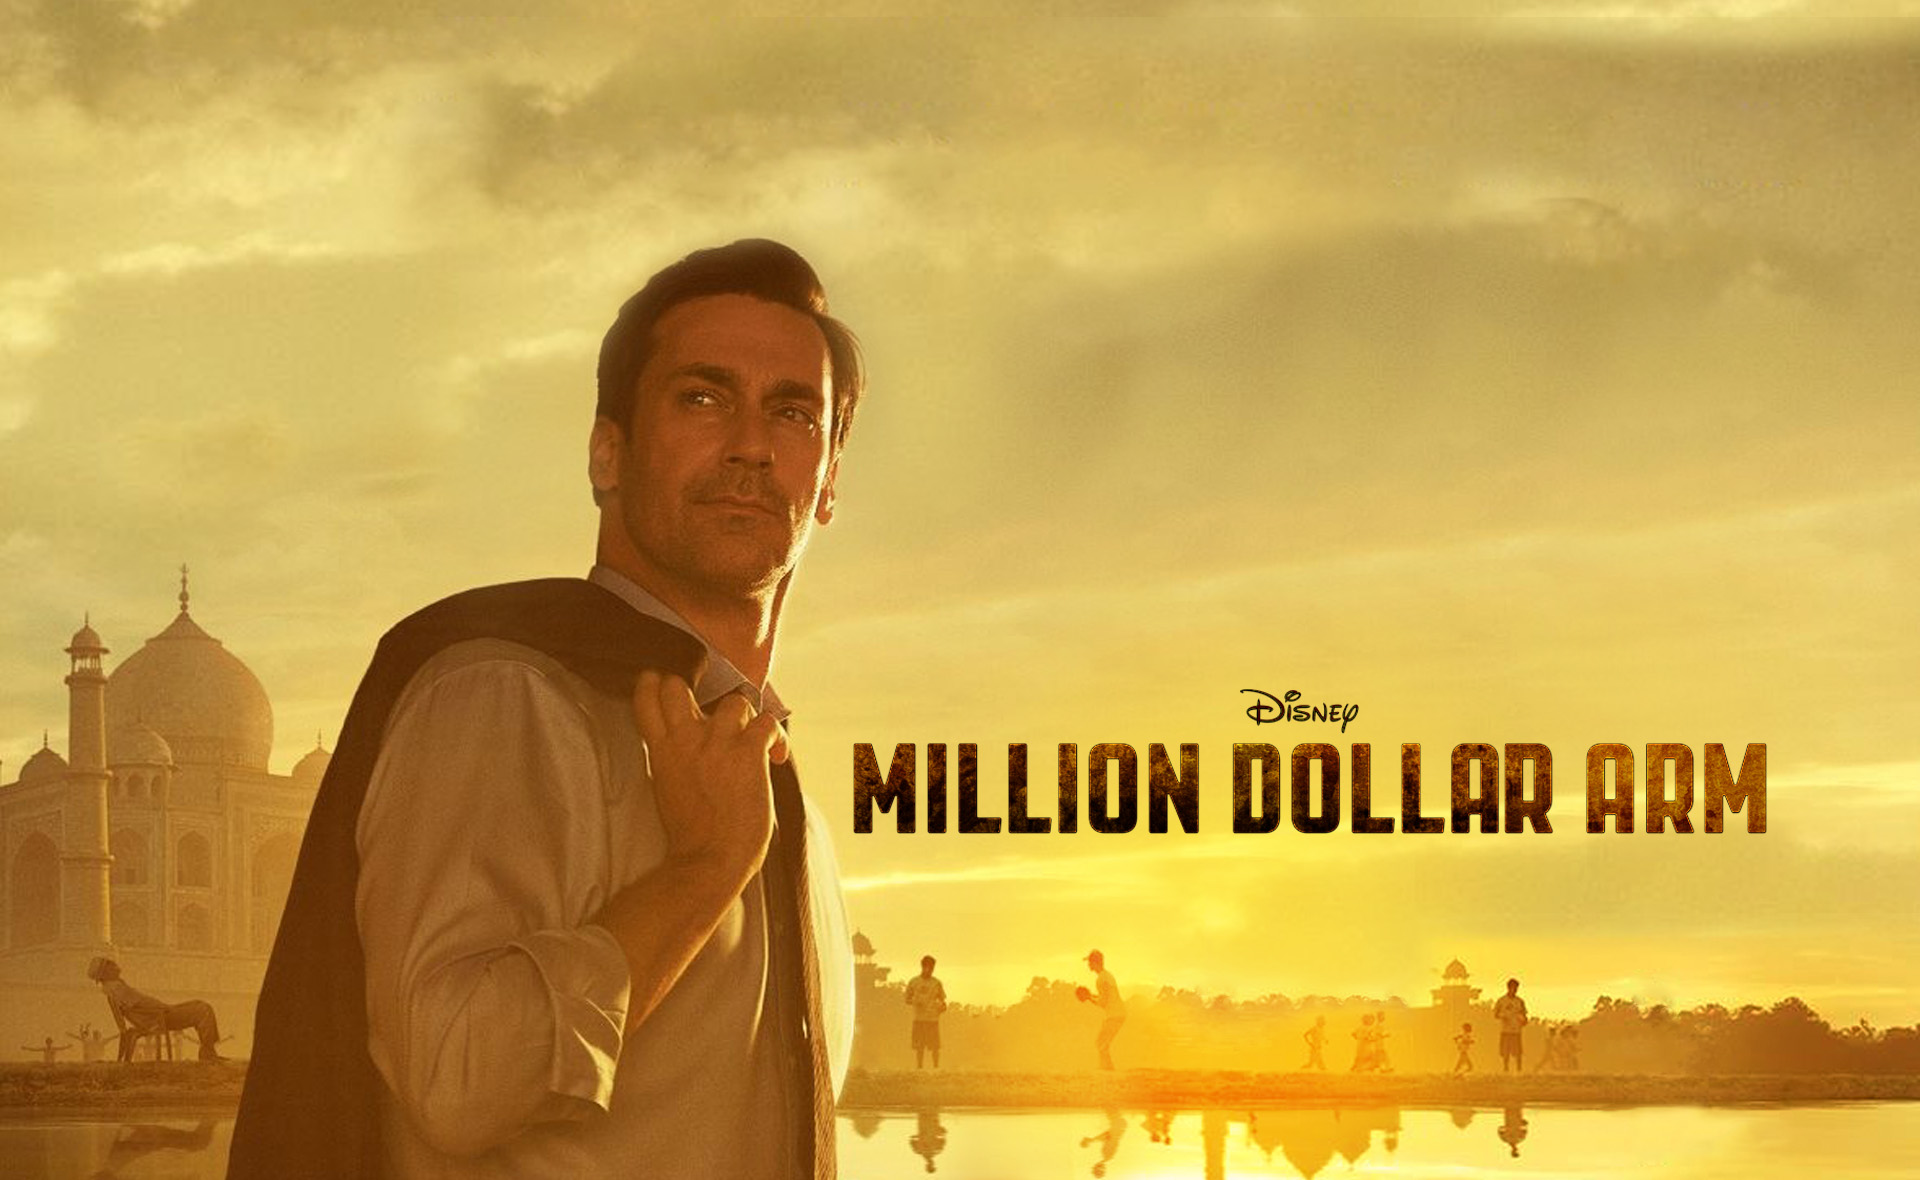 High Resolution Wallpaper | Million Dollar Arm 1920x1180 px